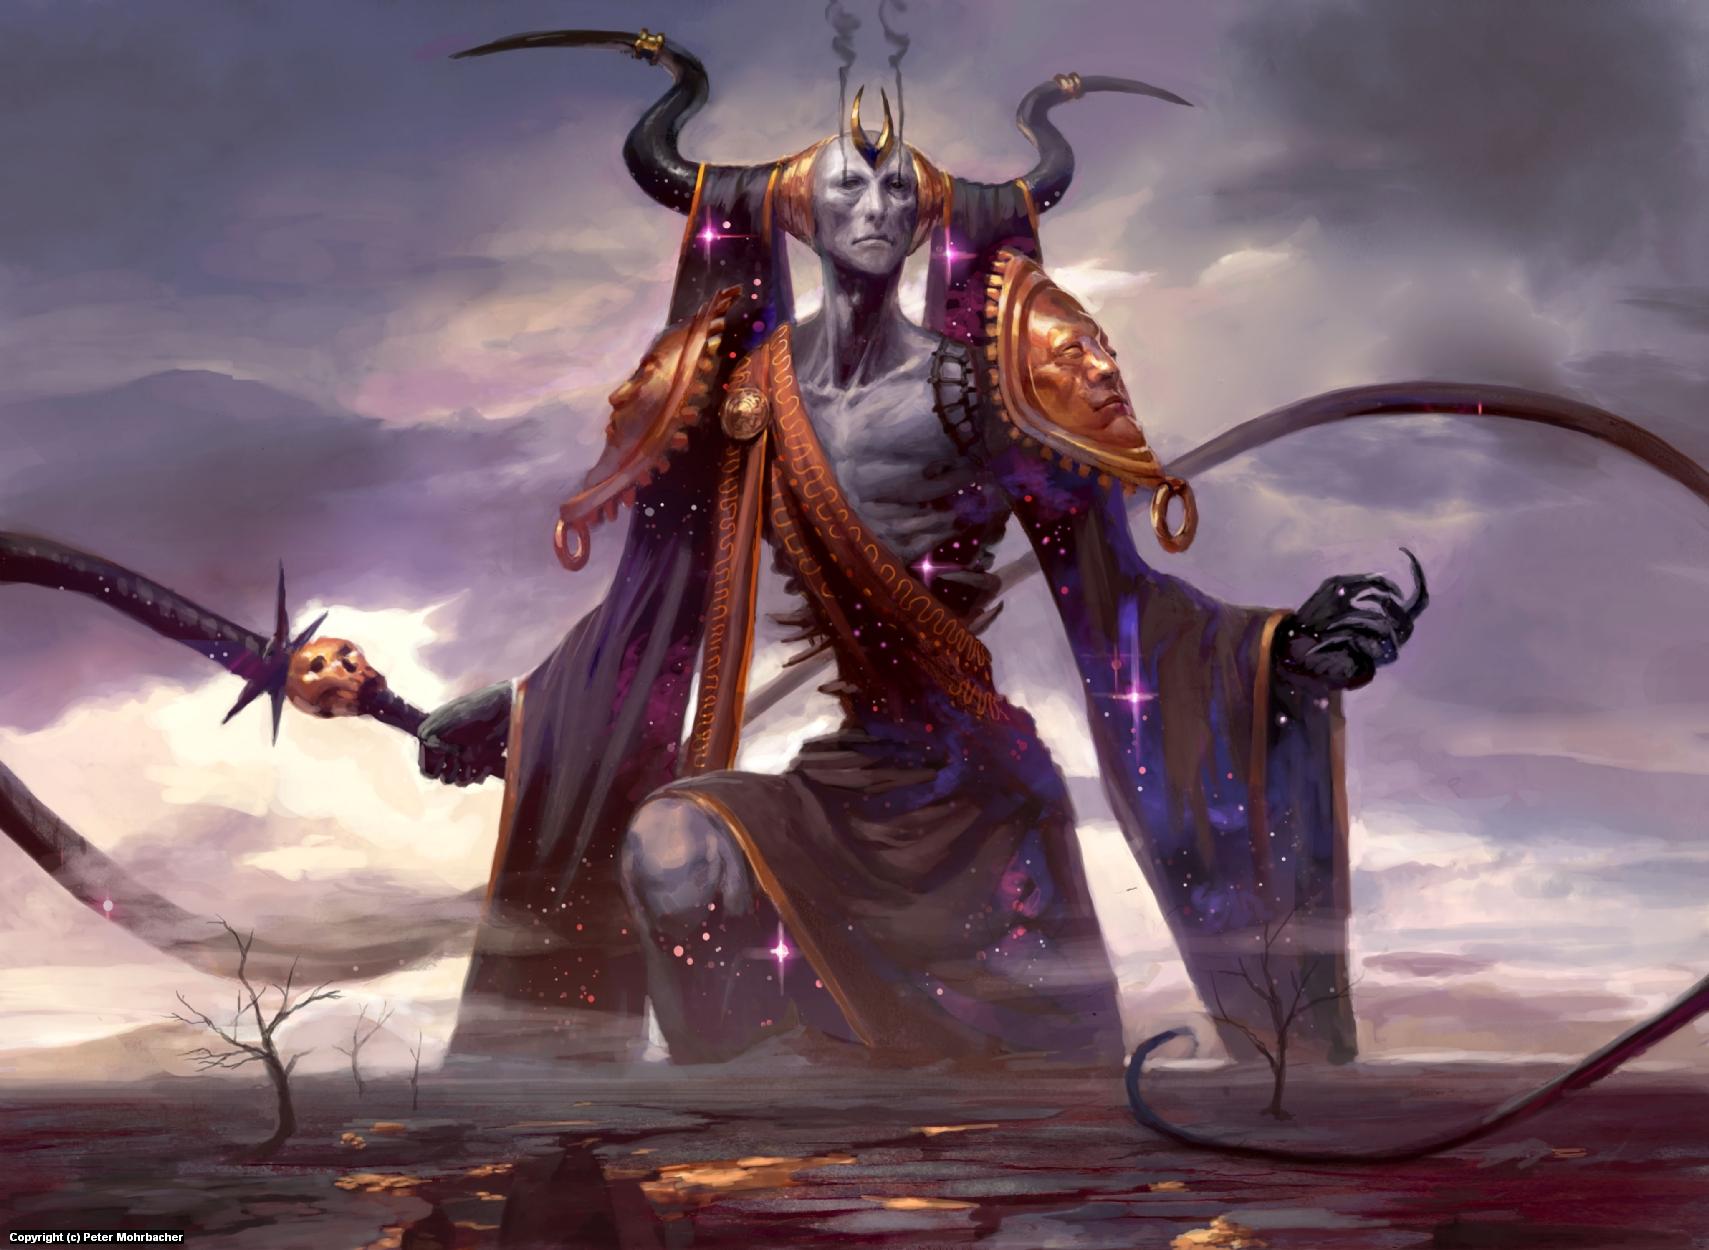 Erebos, God of Death Artwork by Peter Mohrbacher